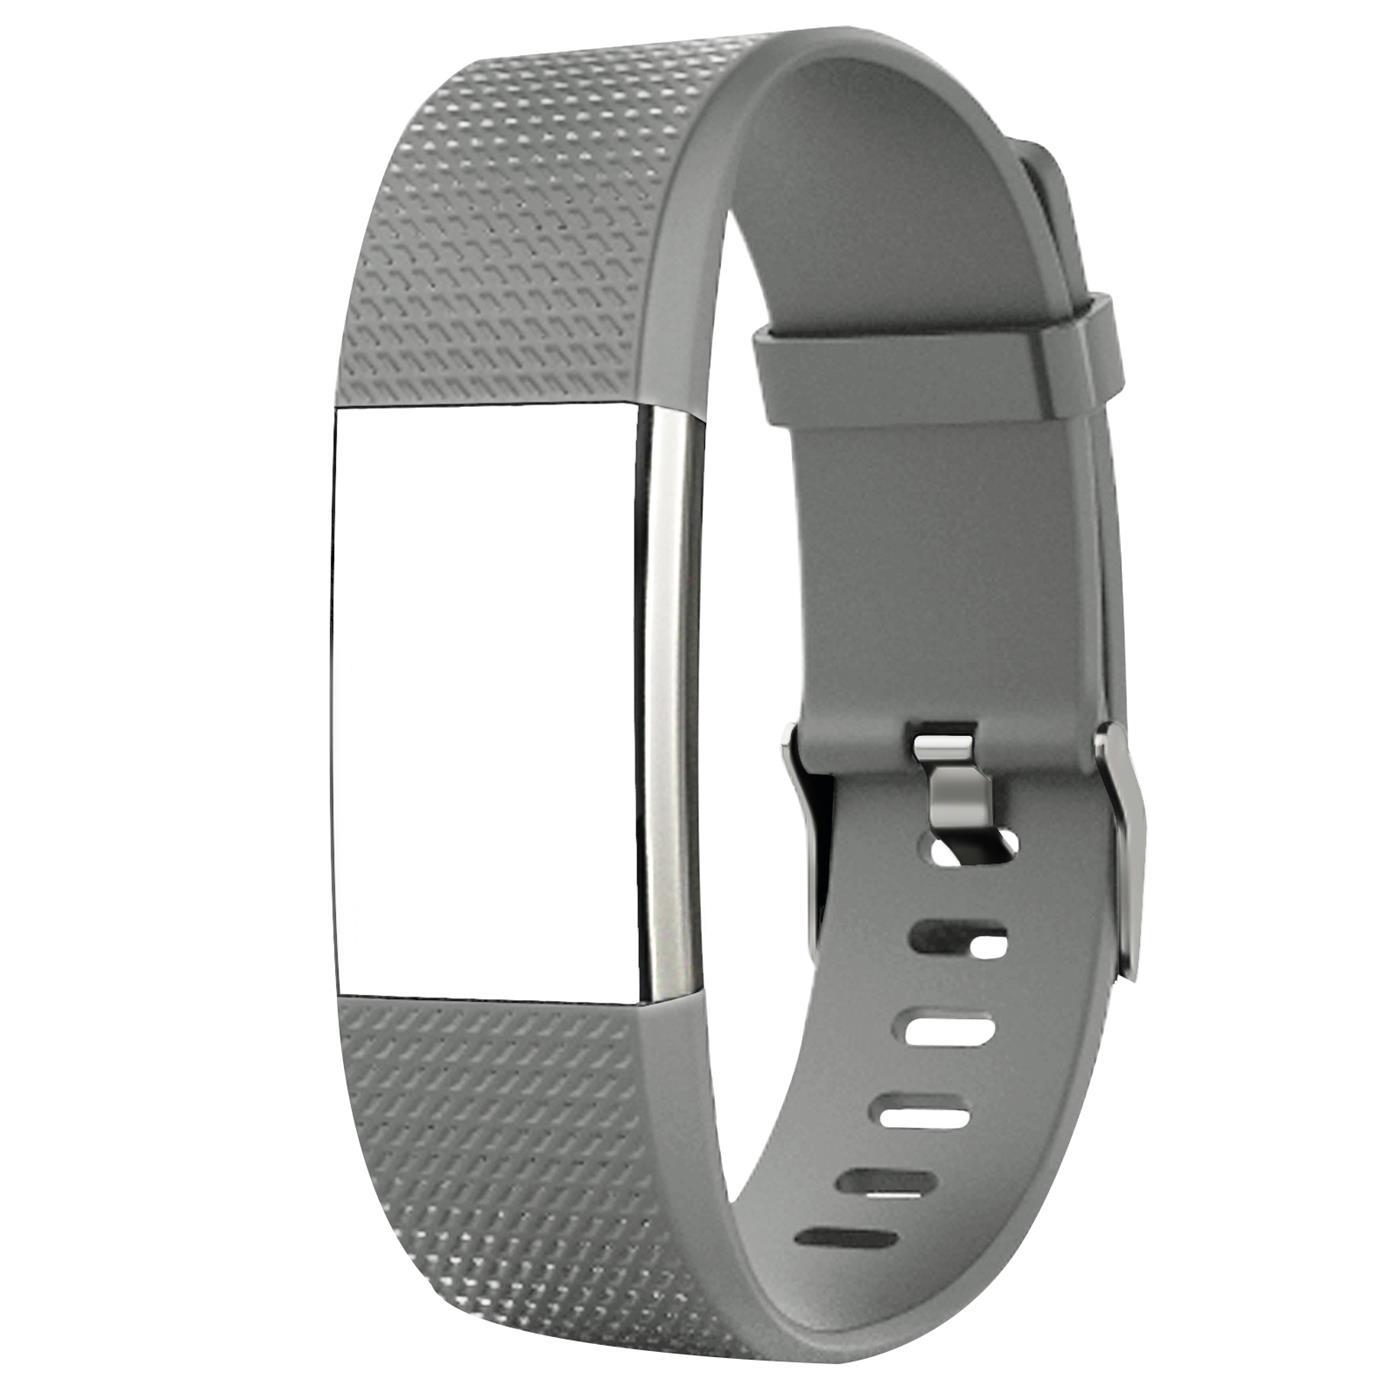 Fitbit-Groesse-S-oder-L-Ersatz-Silikon-Armband-Uhren-Sport-Band-Fitness-Tracker Indexbild 13